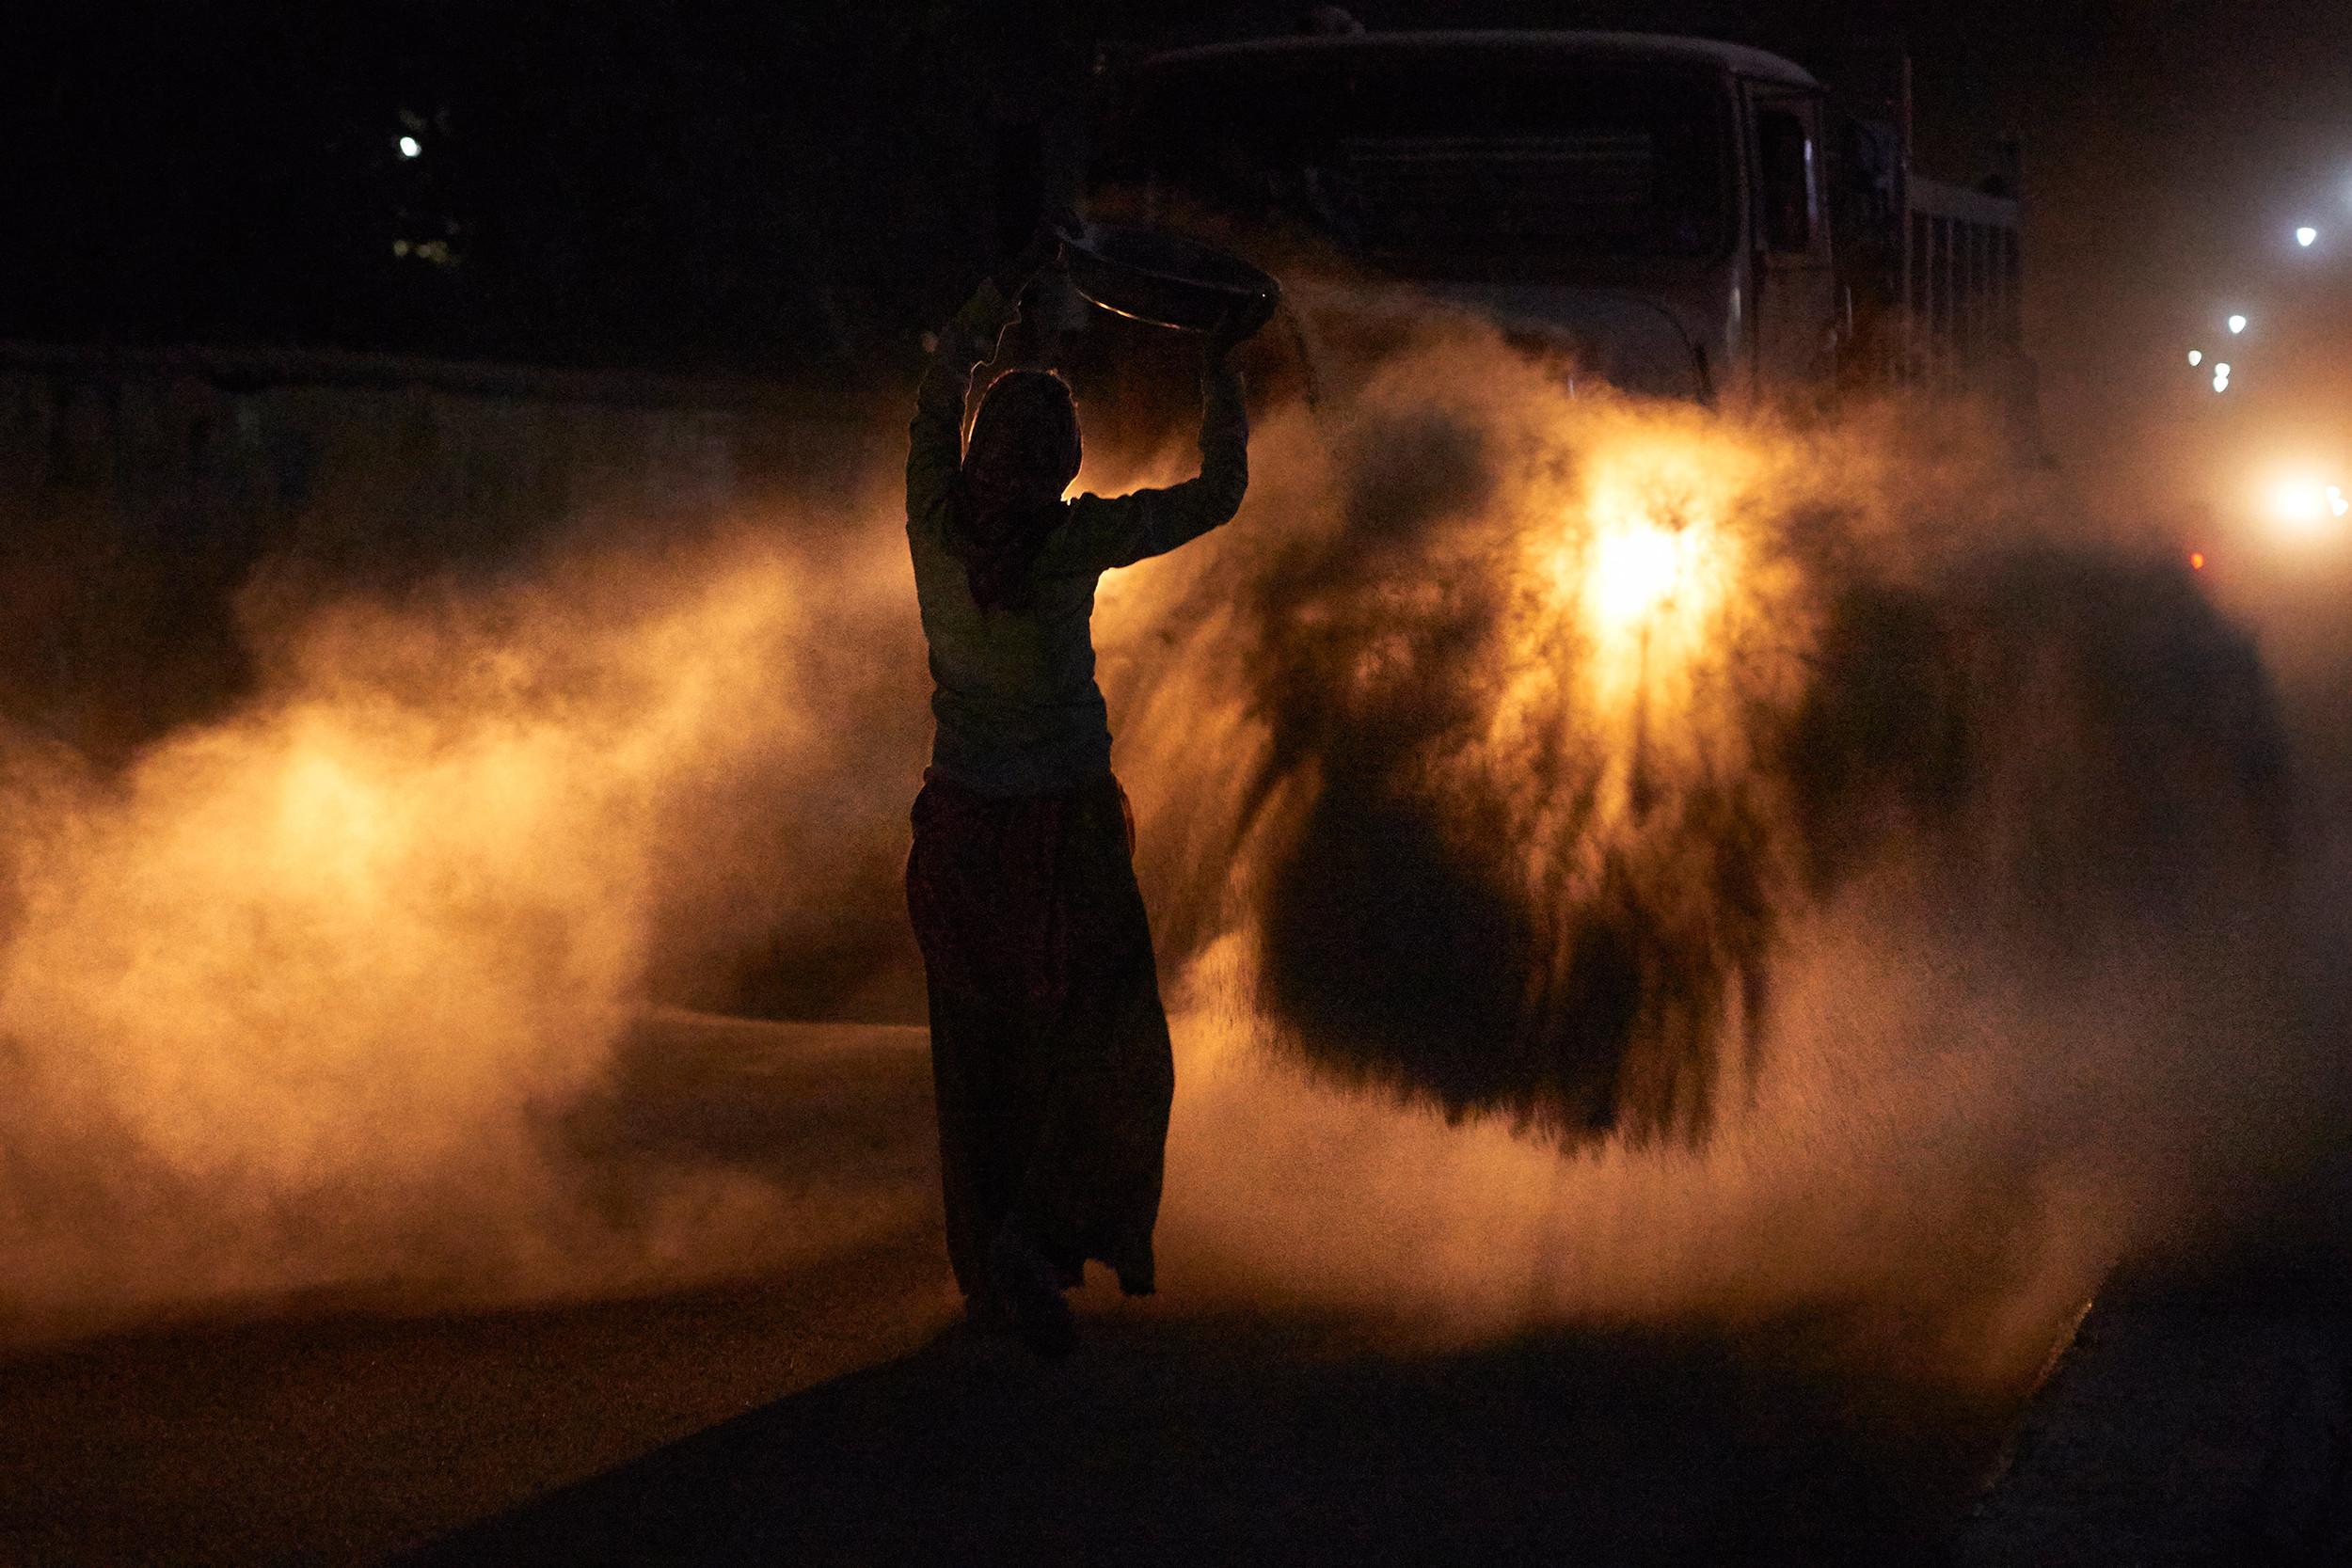 Woman road worker spraying sand over asphalt